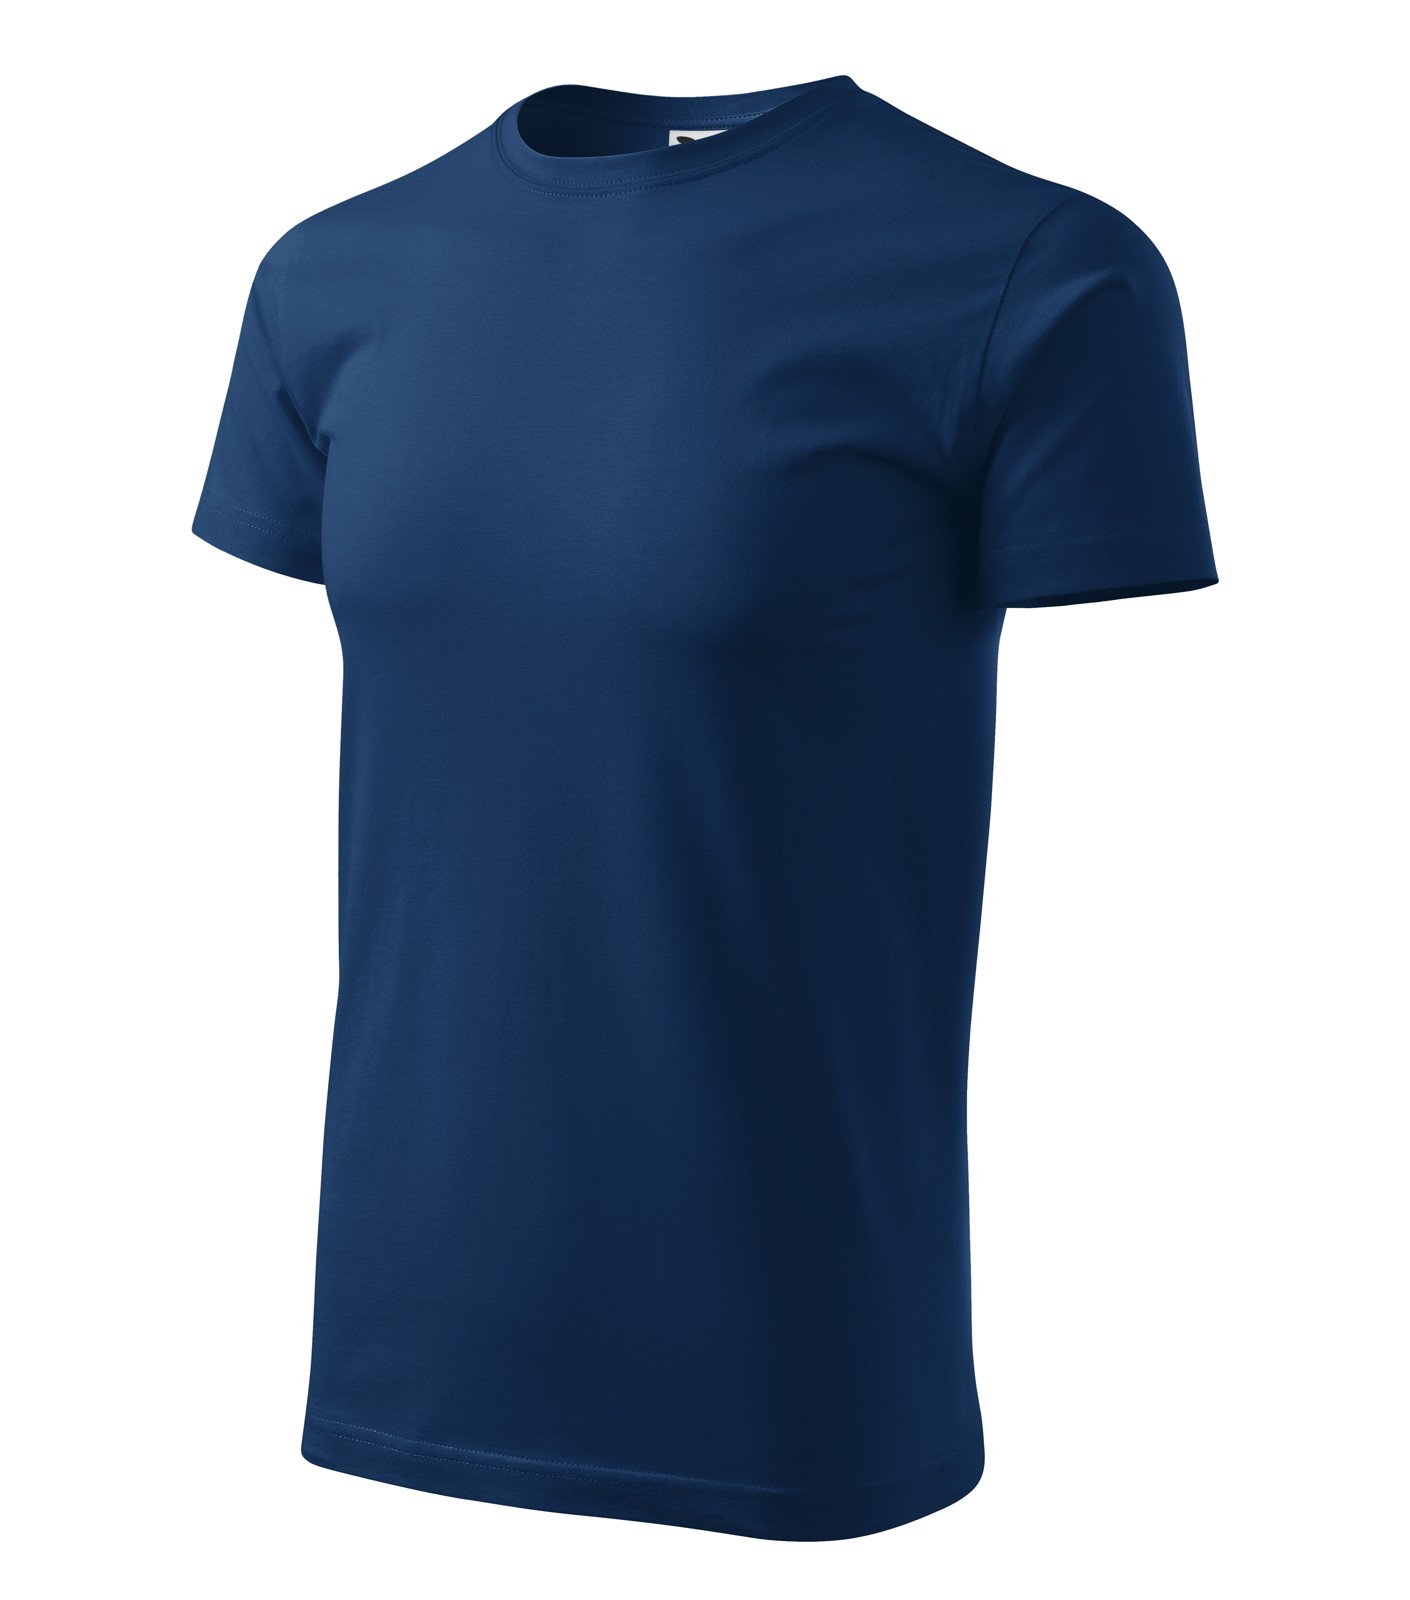 T-shirt men's Malfini Basic - Midnight Blue / 4XL